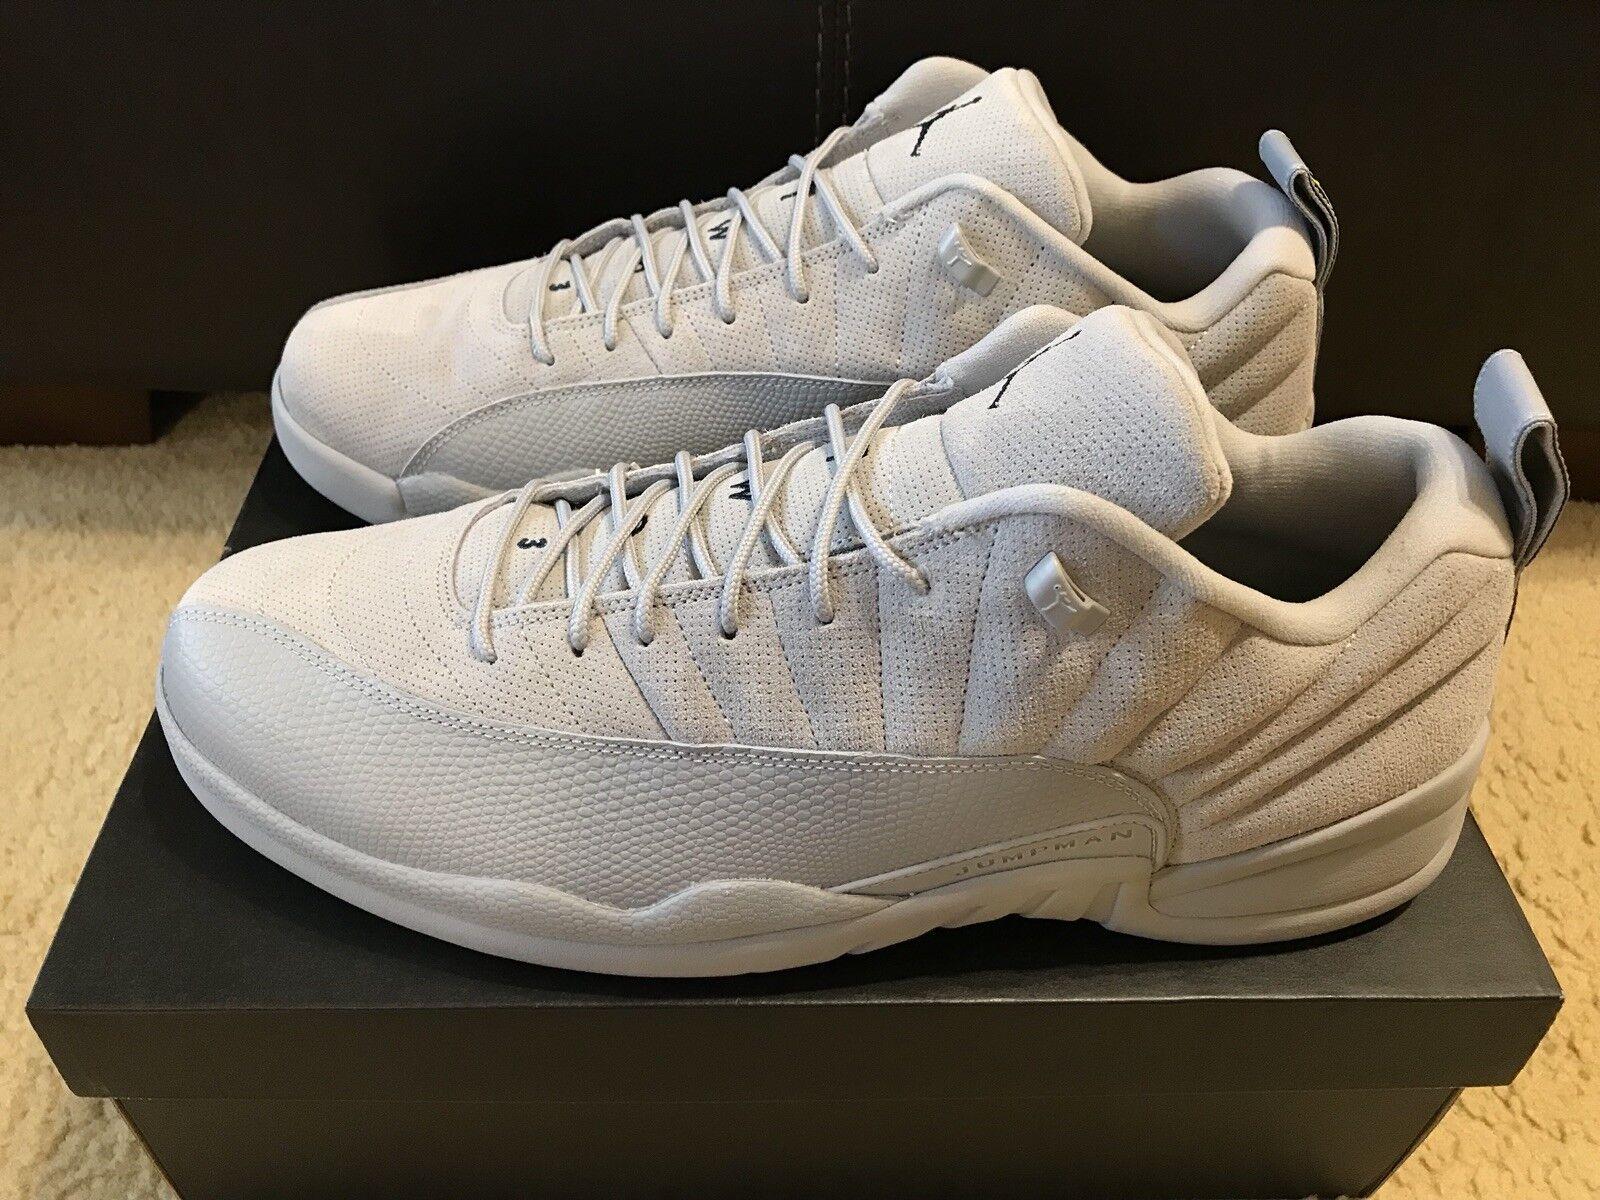 Nike Air Jordan 12 12 12 Retro Low Uomo sz 16 Wolf grigio Suede 308317 002 NIB 01e51b